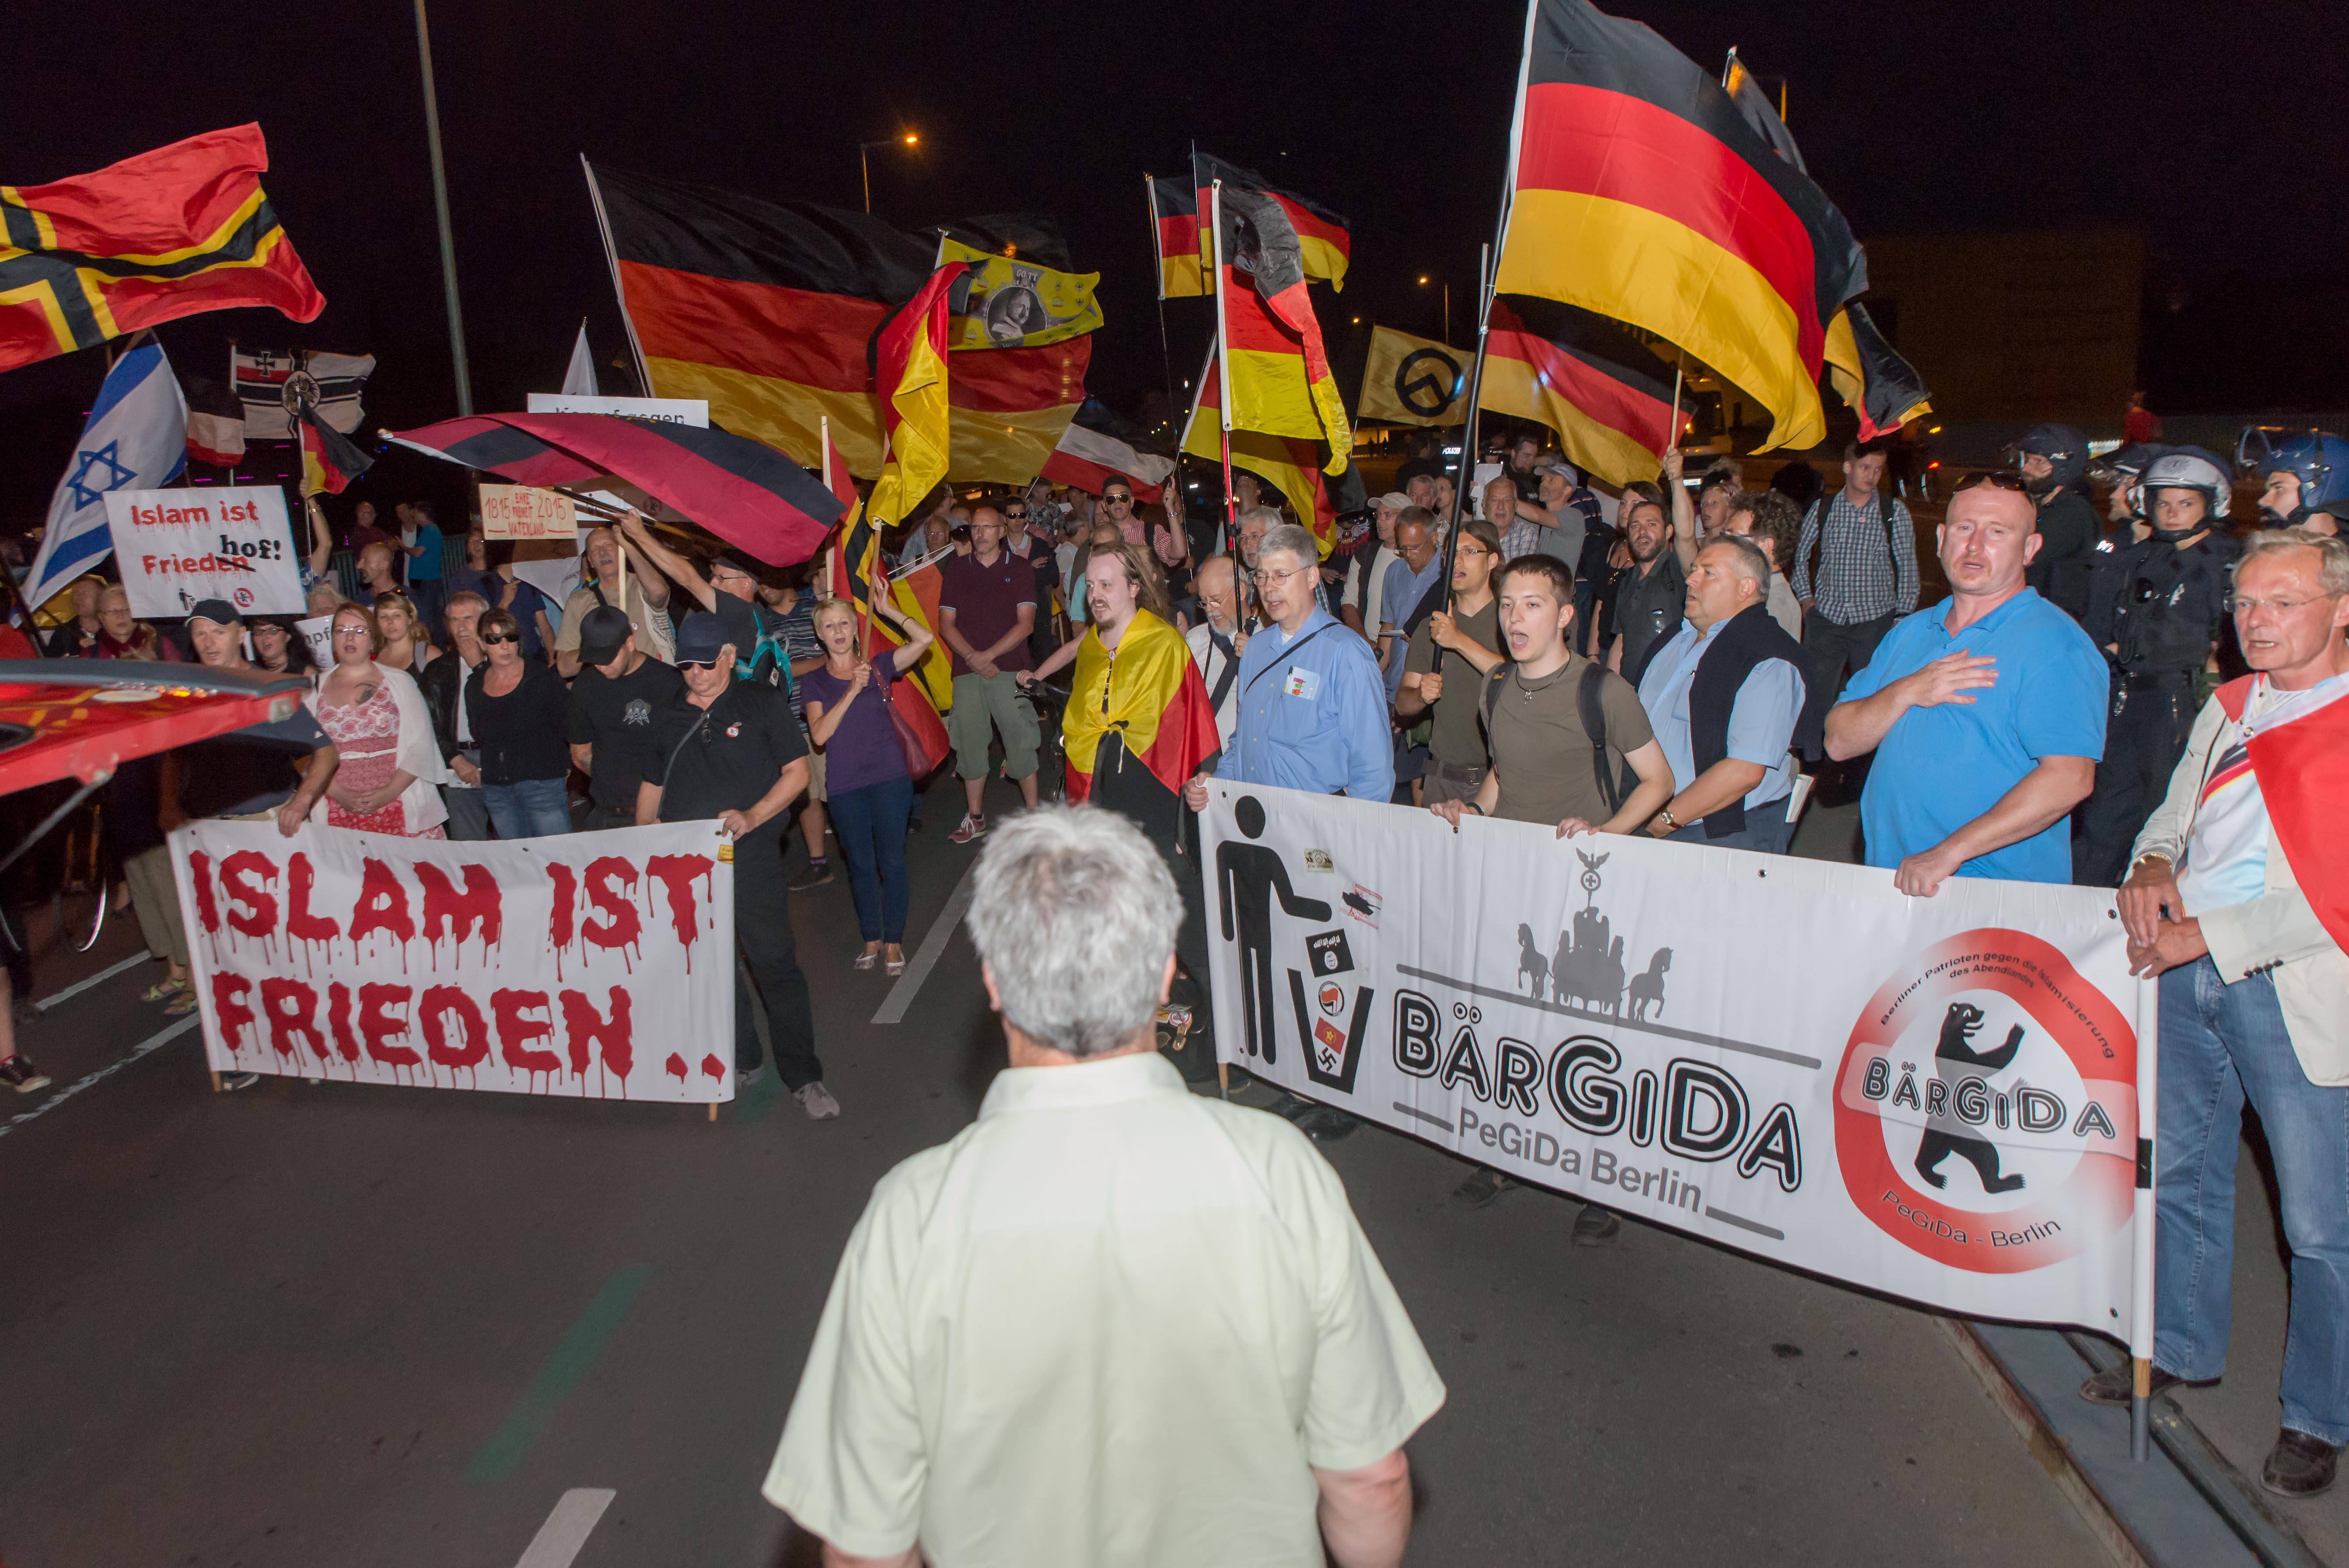 Mit Reichskriegsfahnen vor dem Deportationsmahnmal - Berliner Polizei ermöglicht Bärgida skandalöse Provokation